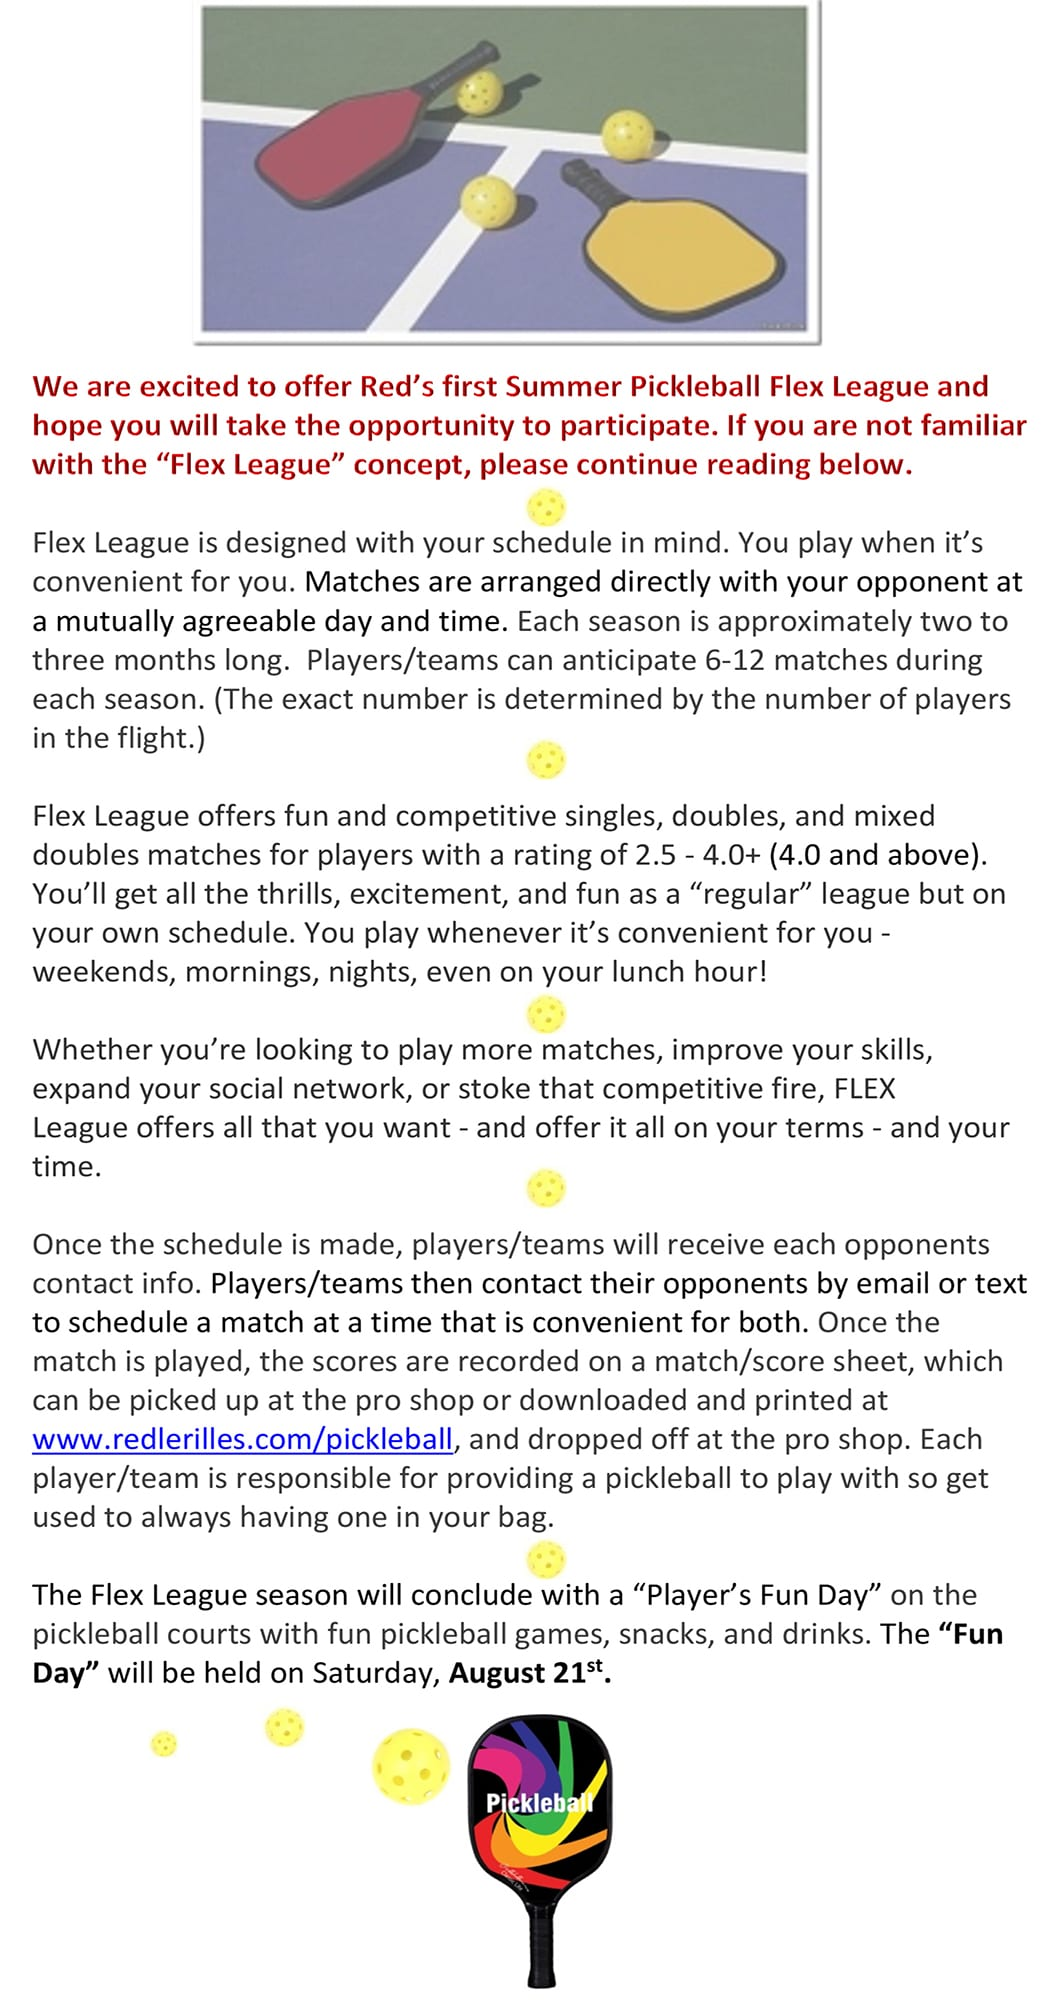 Pickleball Flex League